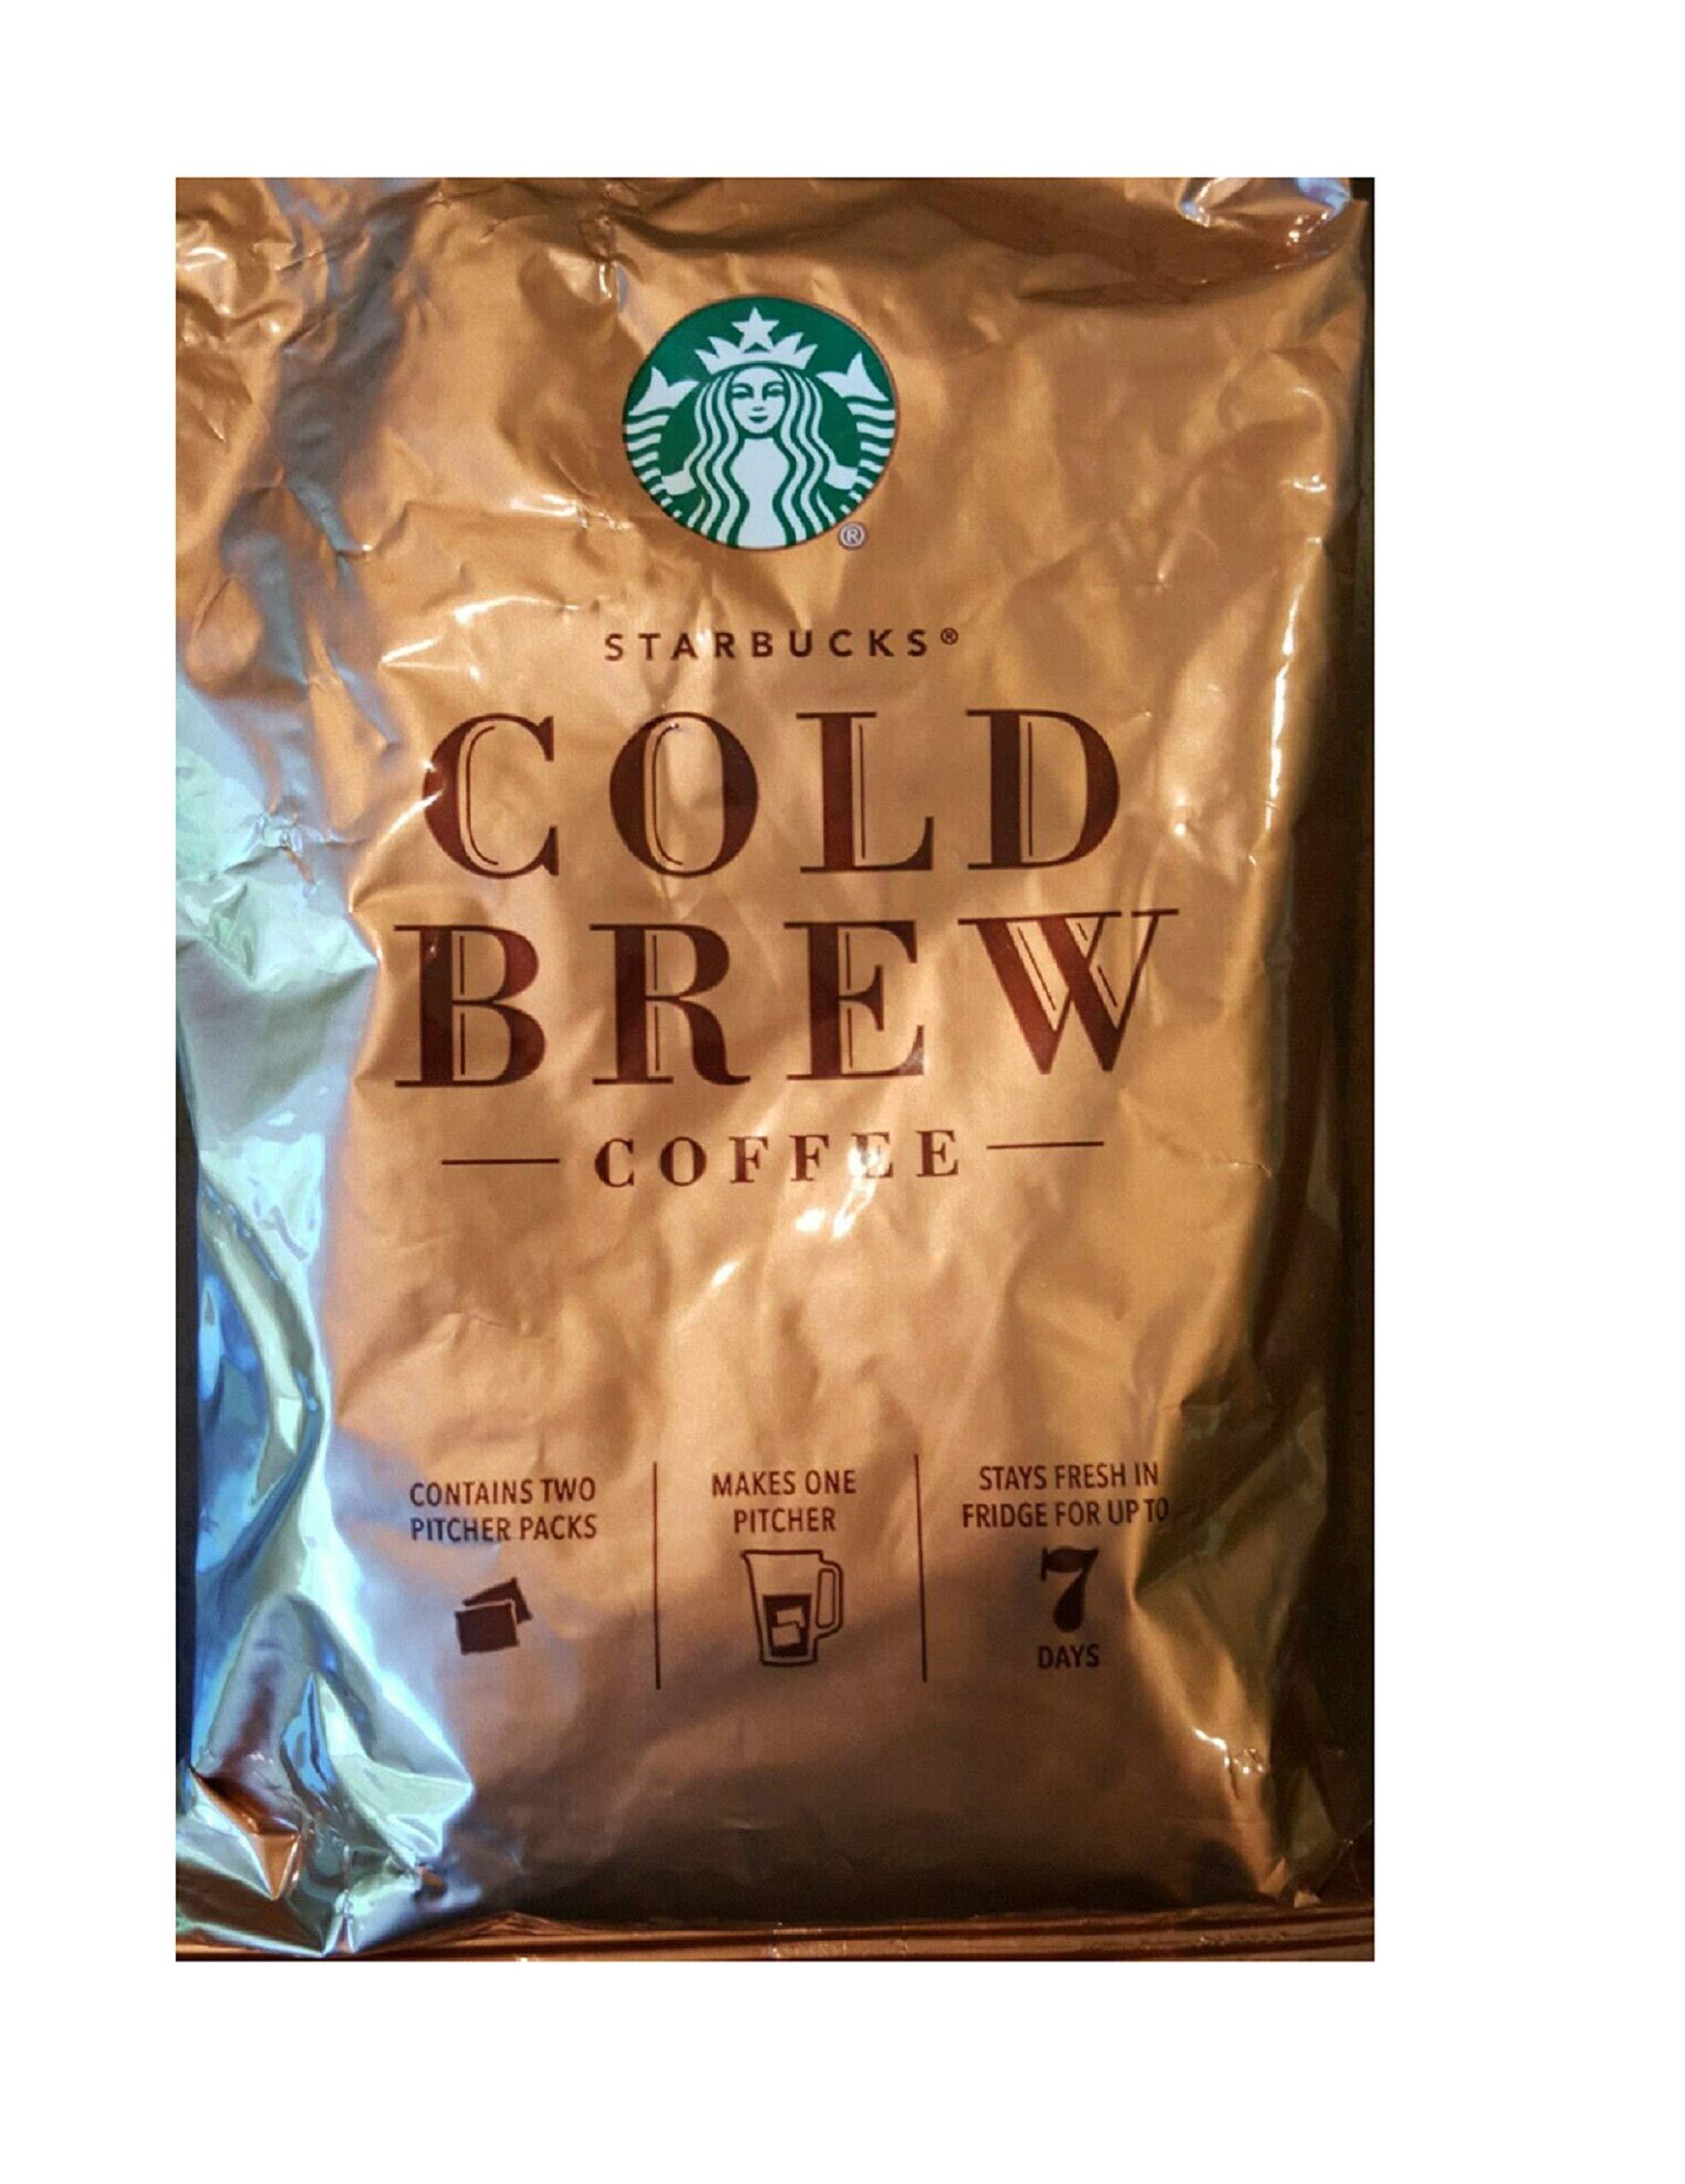 Starbucks Cold Brew Coffee, Medium Roast Coffee, 8.6 Oz. (Makes 10 Pitchers) by Starbucks Cold Brew